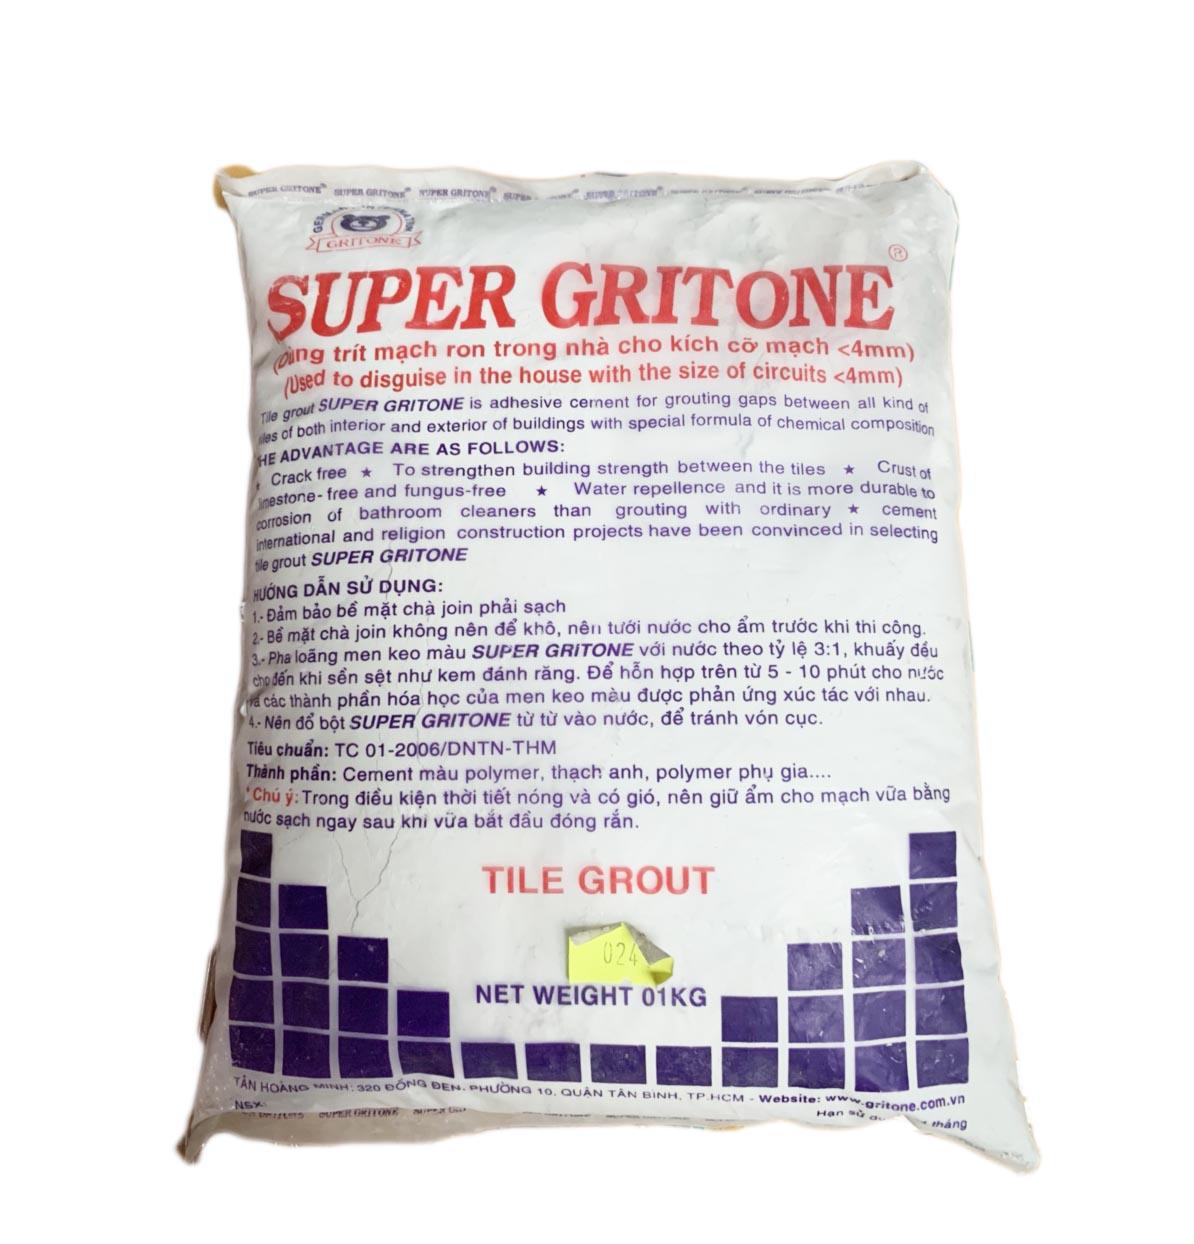 Keo chà ron Super Gritone màu khói lợt SP-17 ( Gói / Kg)